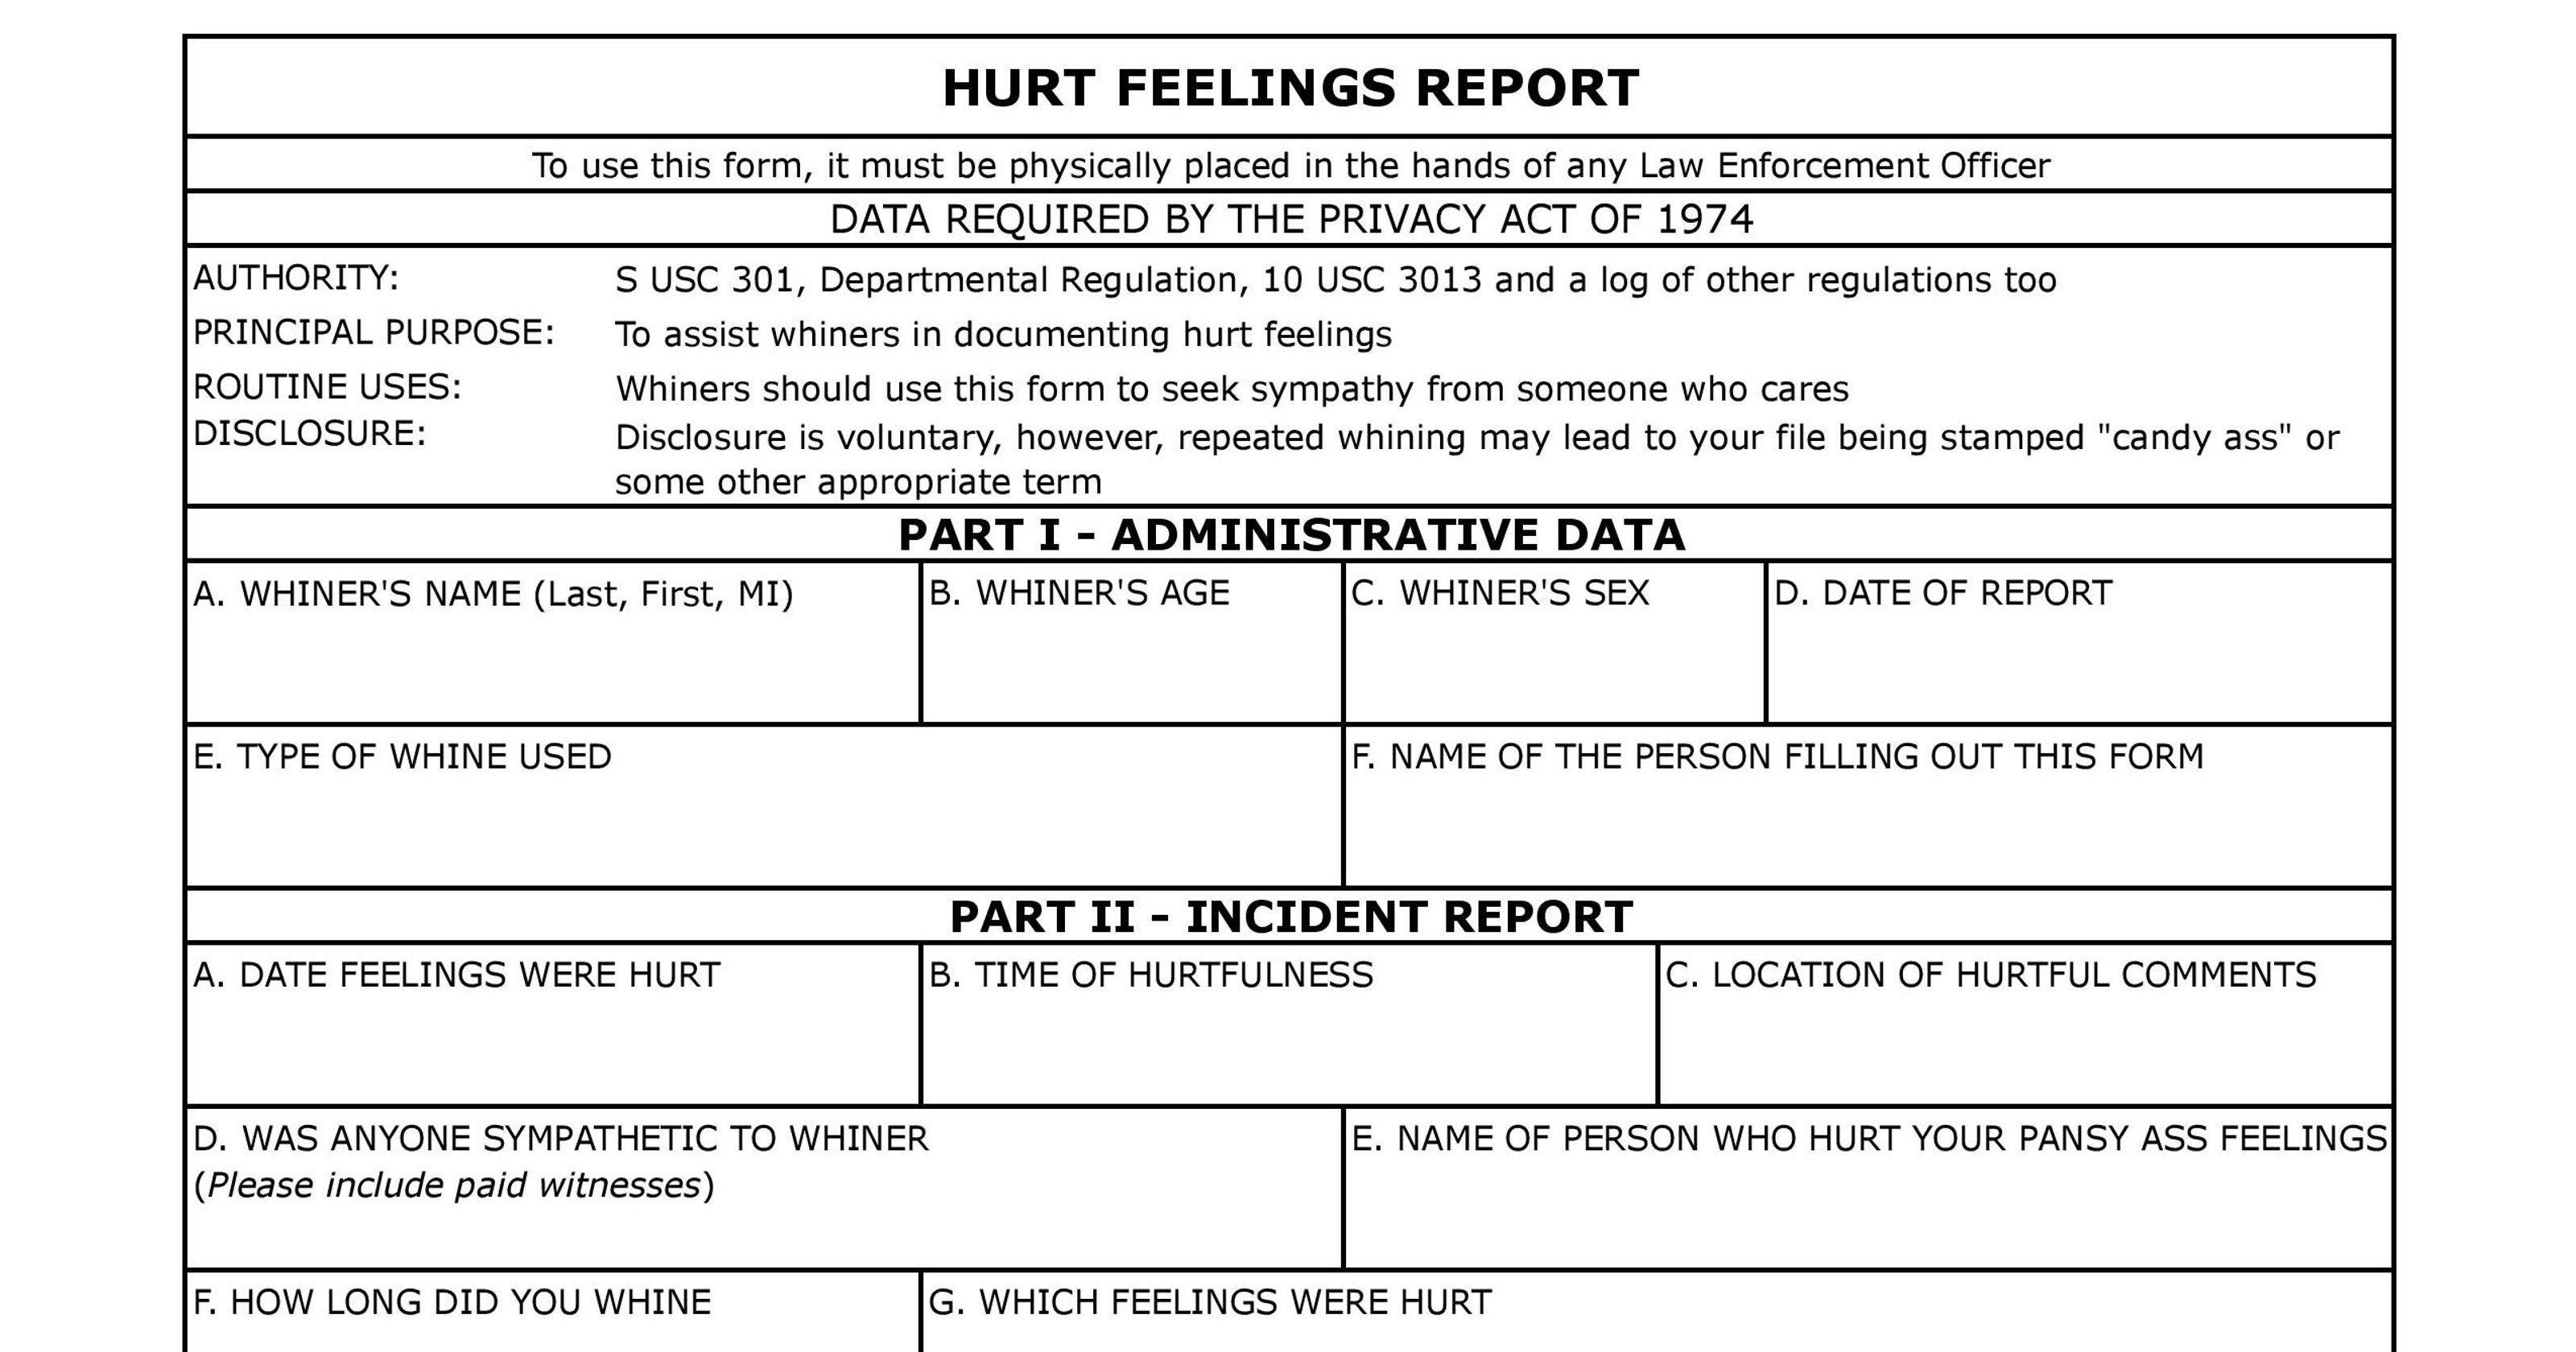 Template Hurt Feelings Report  Savethemdctrails Regarding Hurt Feelings Report Template